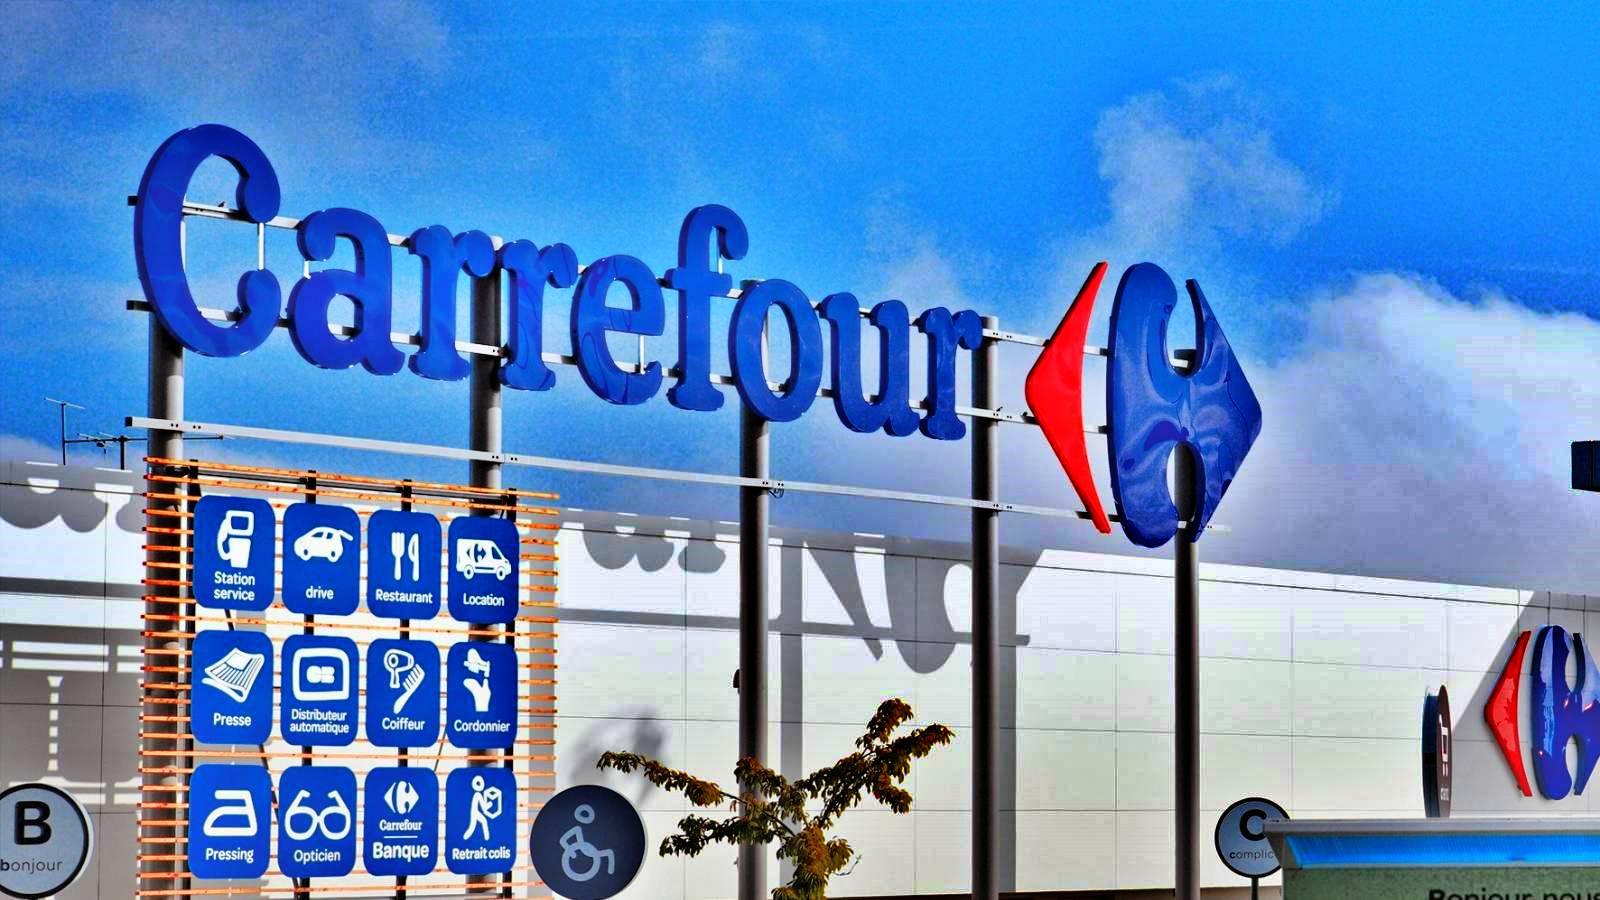 Carrefour cupon